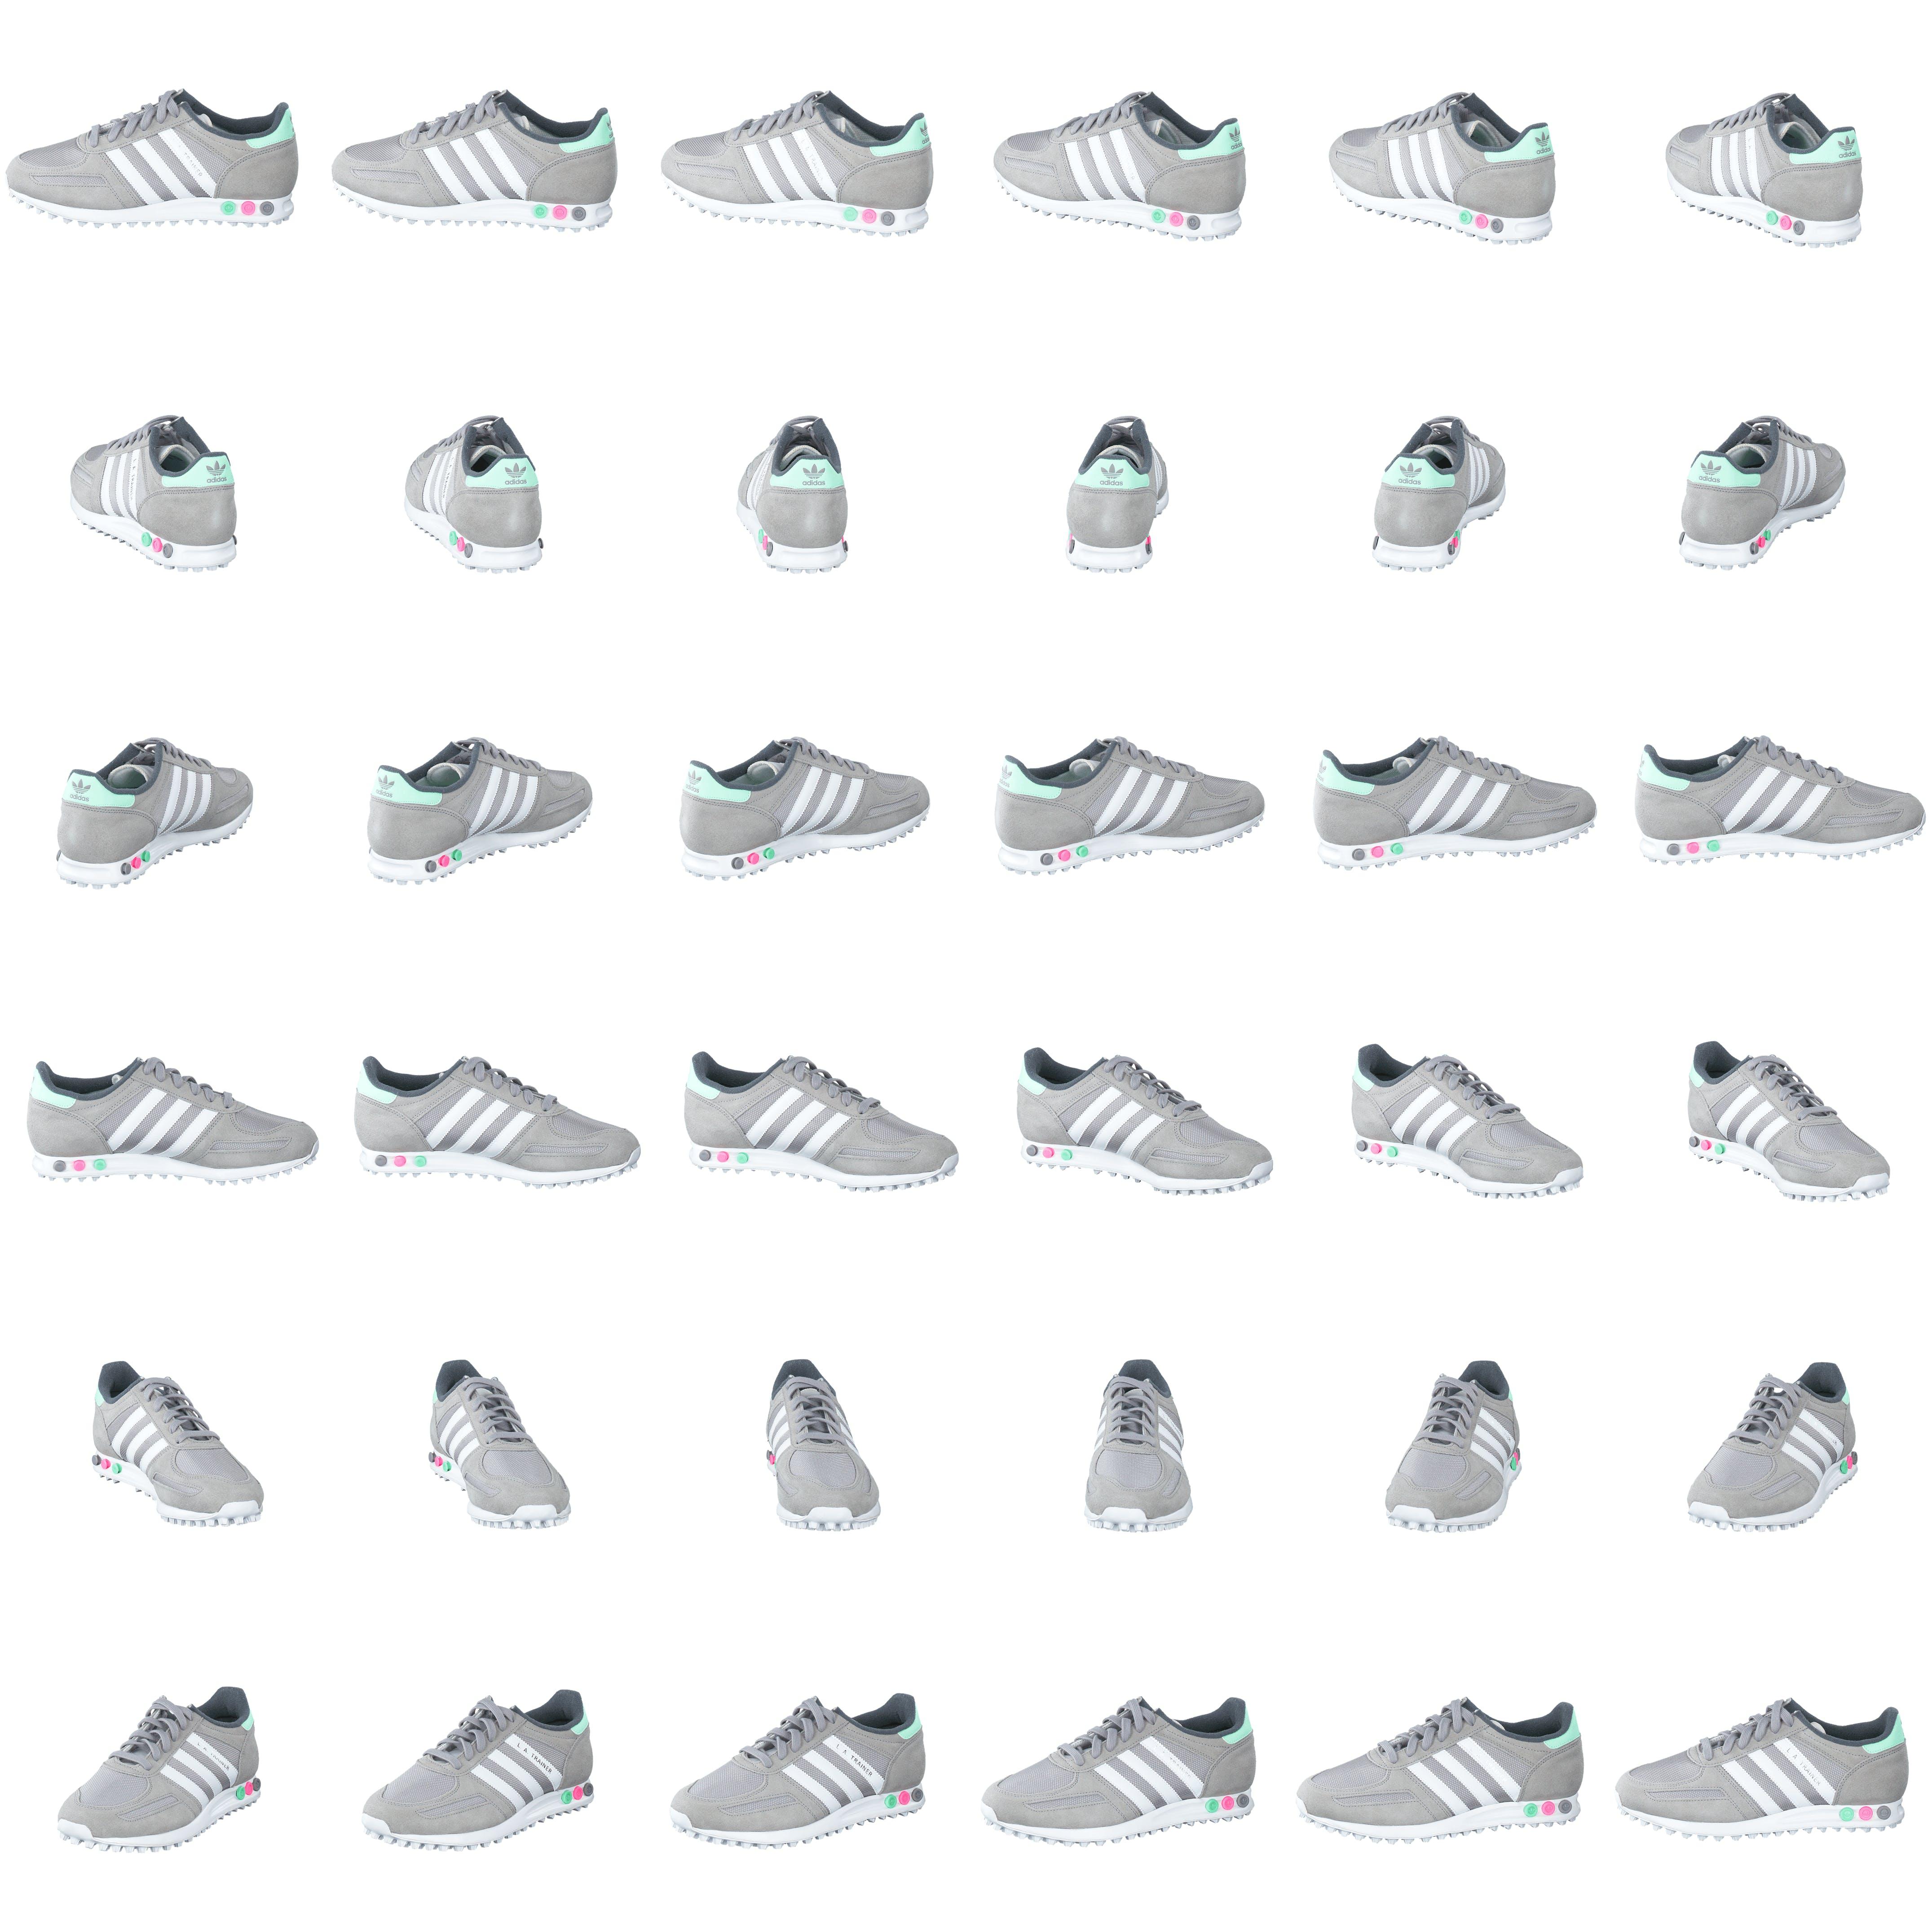 timeless design 533f8 c6510 Buy adidas Originals La Trainer W Light GraniteWhiteGreen White Shoes  Online  FOOTWAY.co.uk